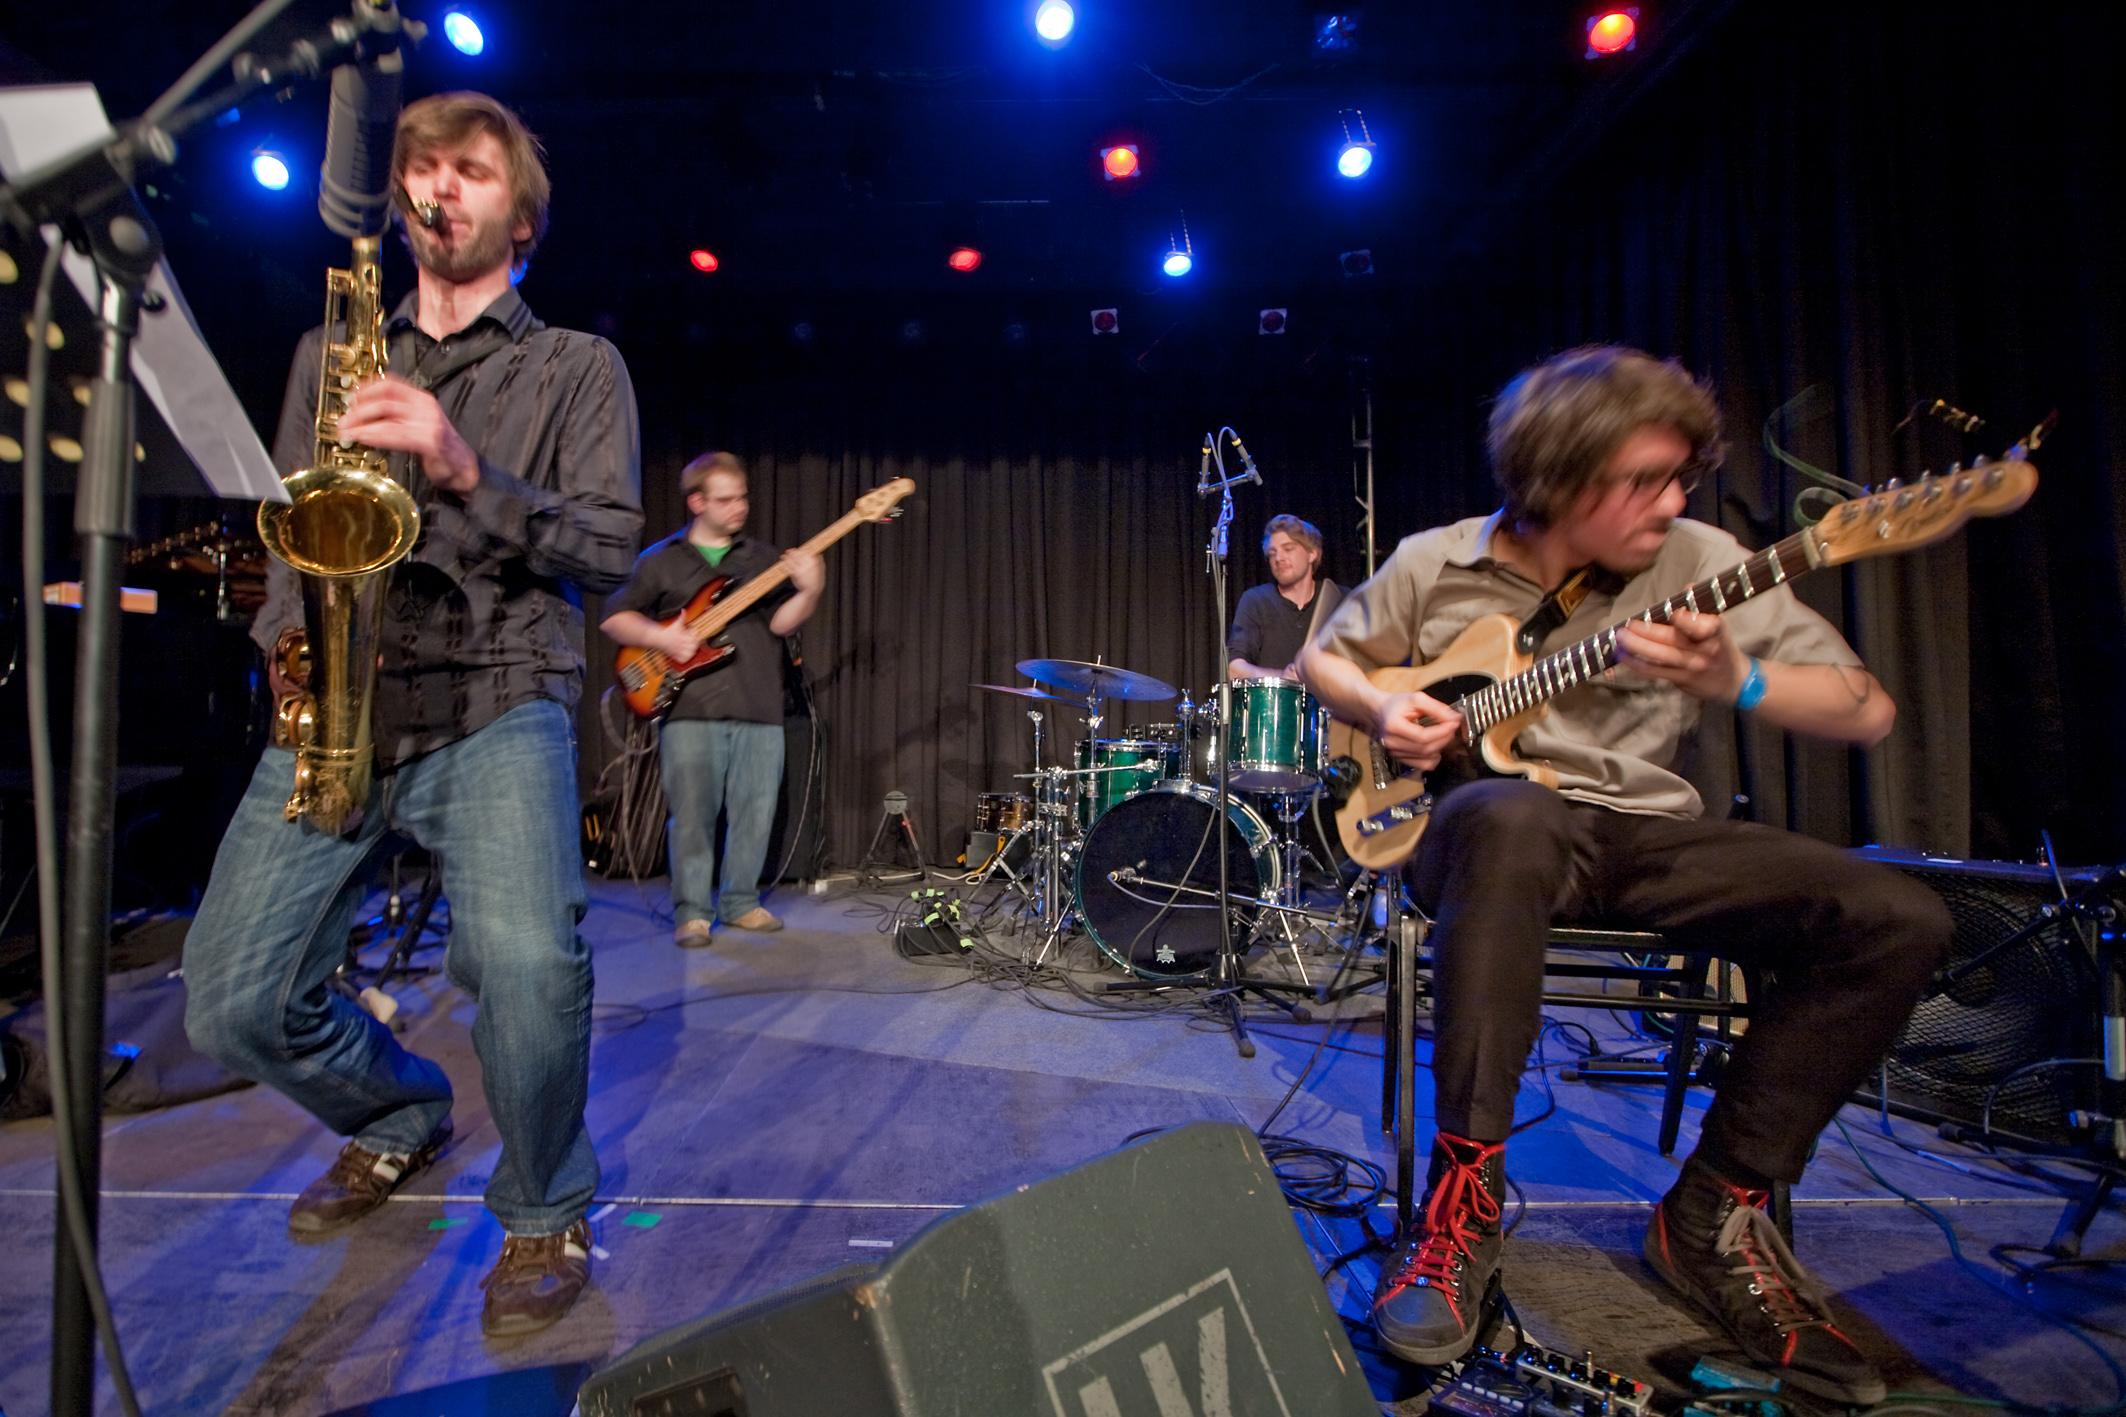 Jumajath Band